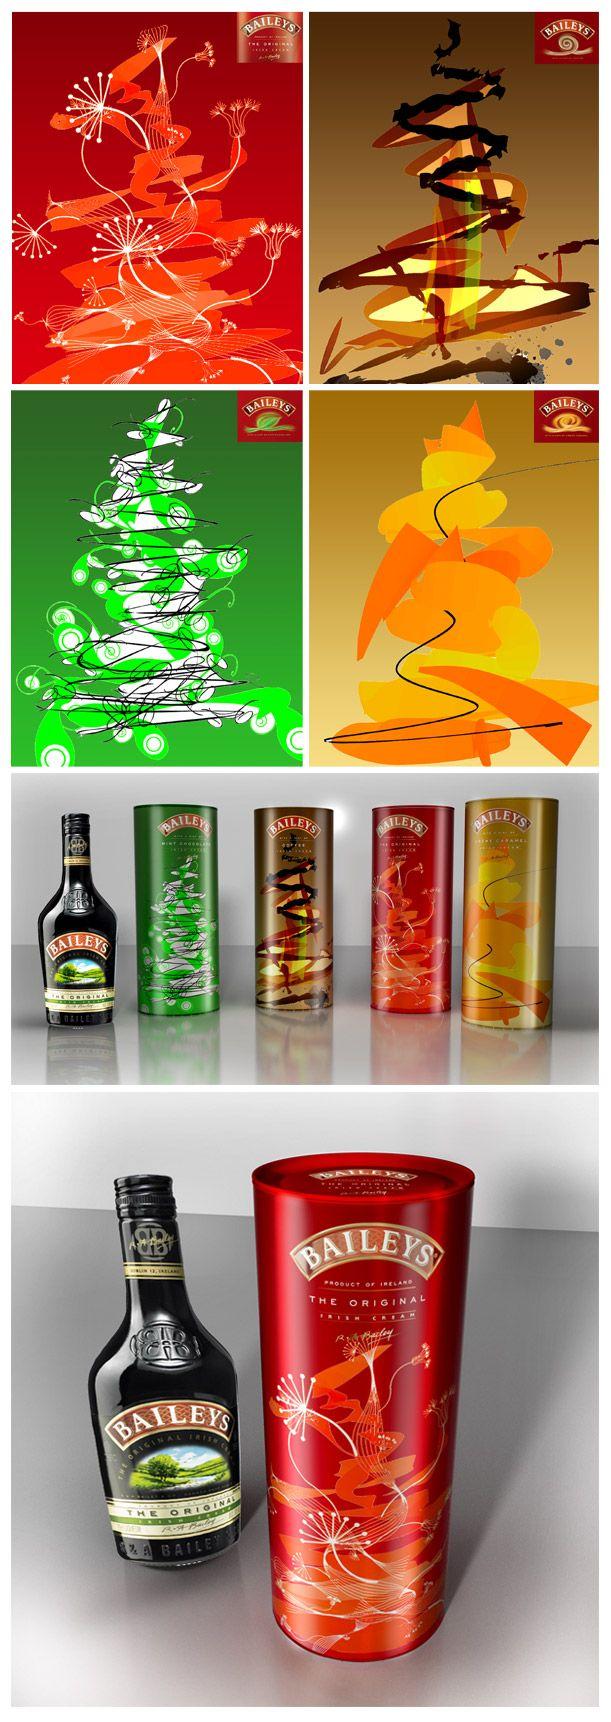 Baileys packaging proposal